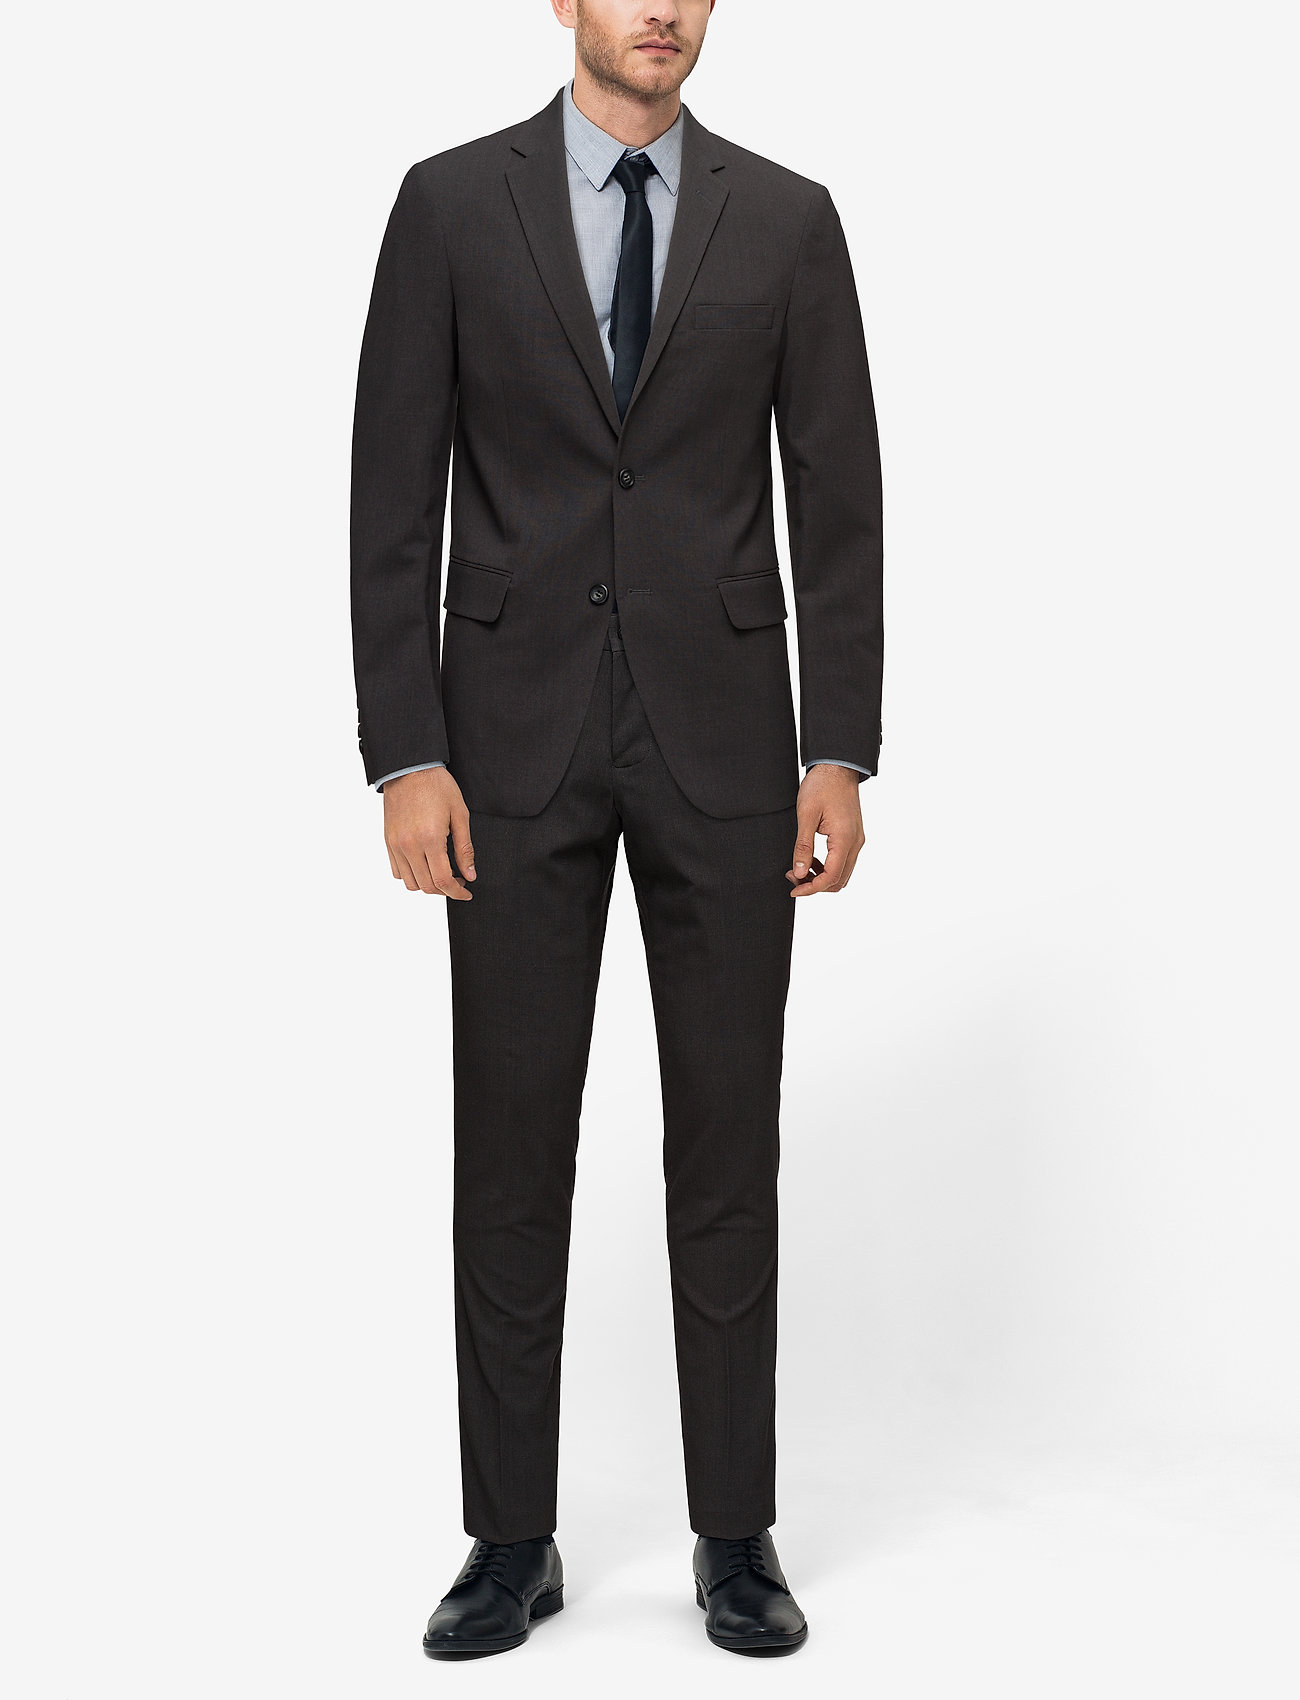 Lindbergh Plain mens suit - DK GREY MEL